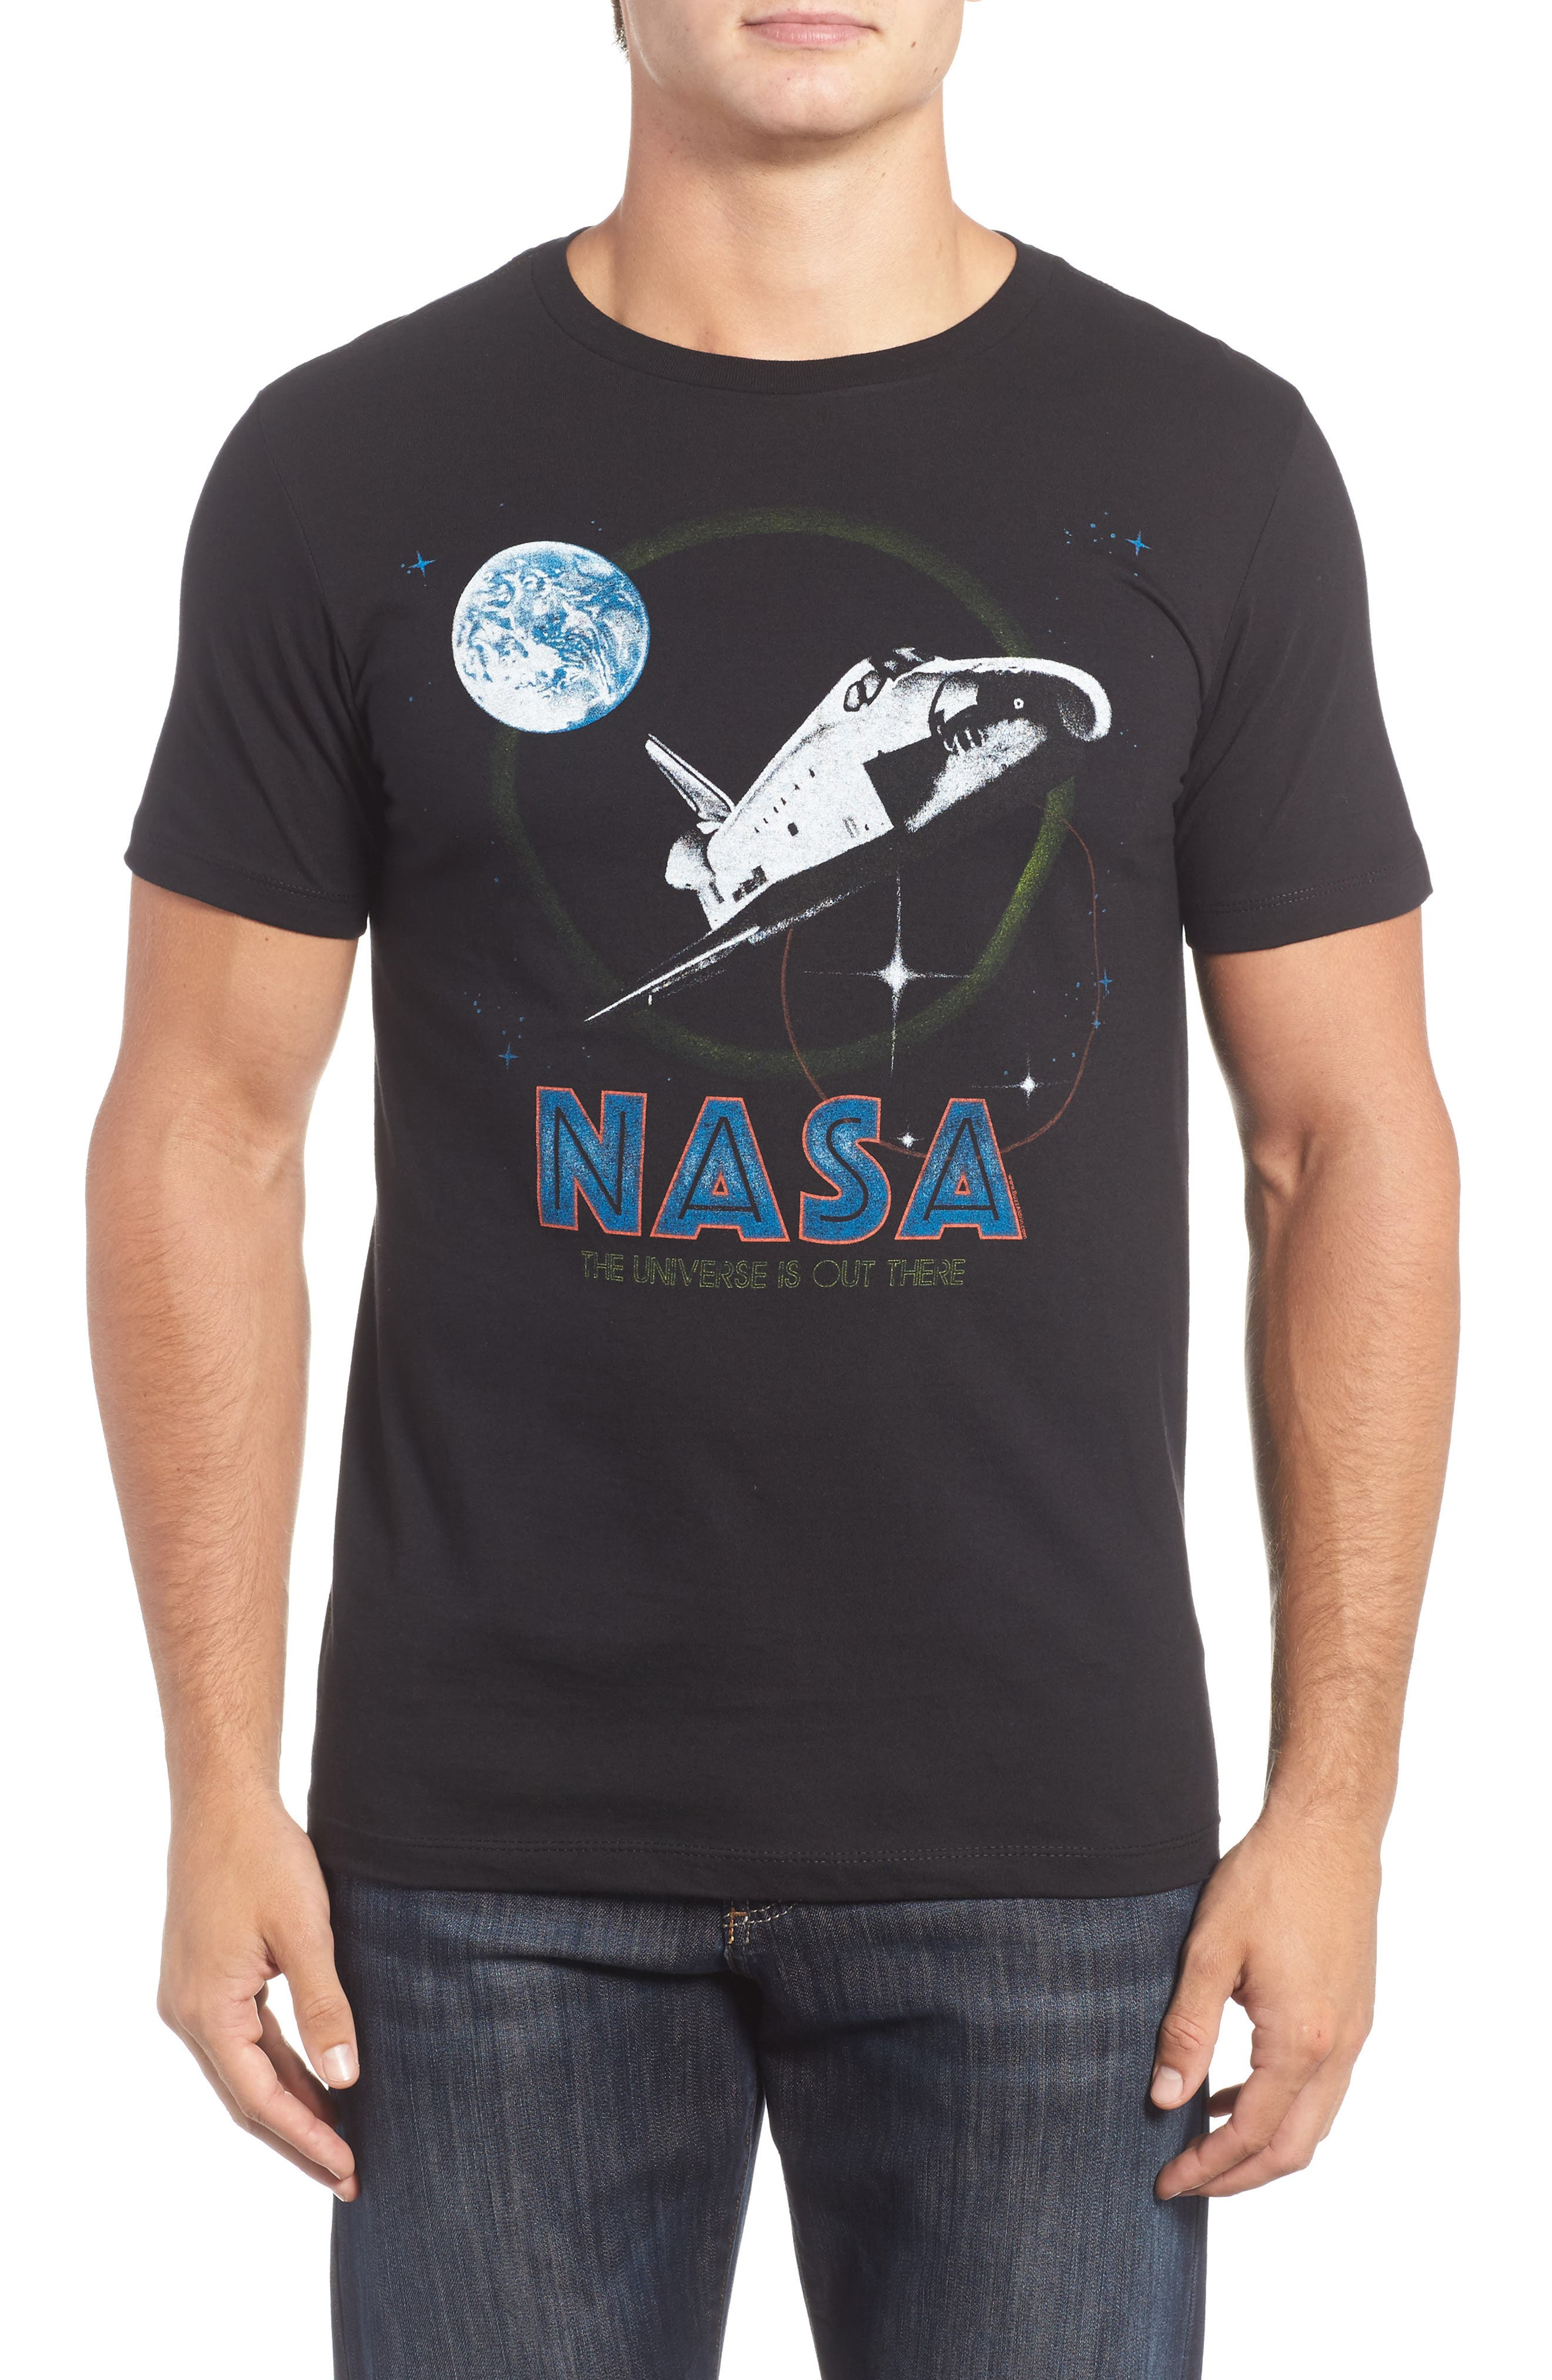 The Rail NASA Graphic T-Shirt